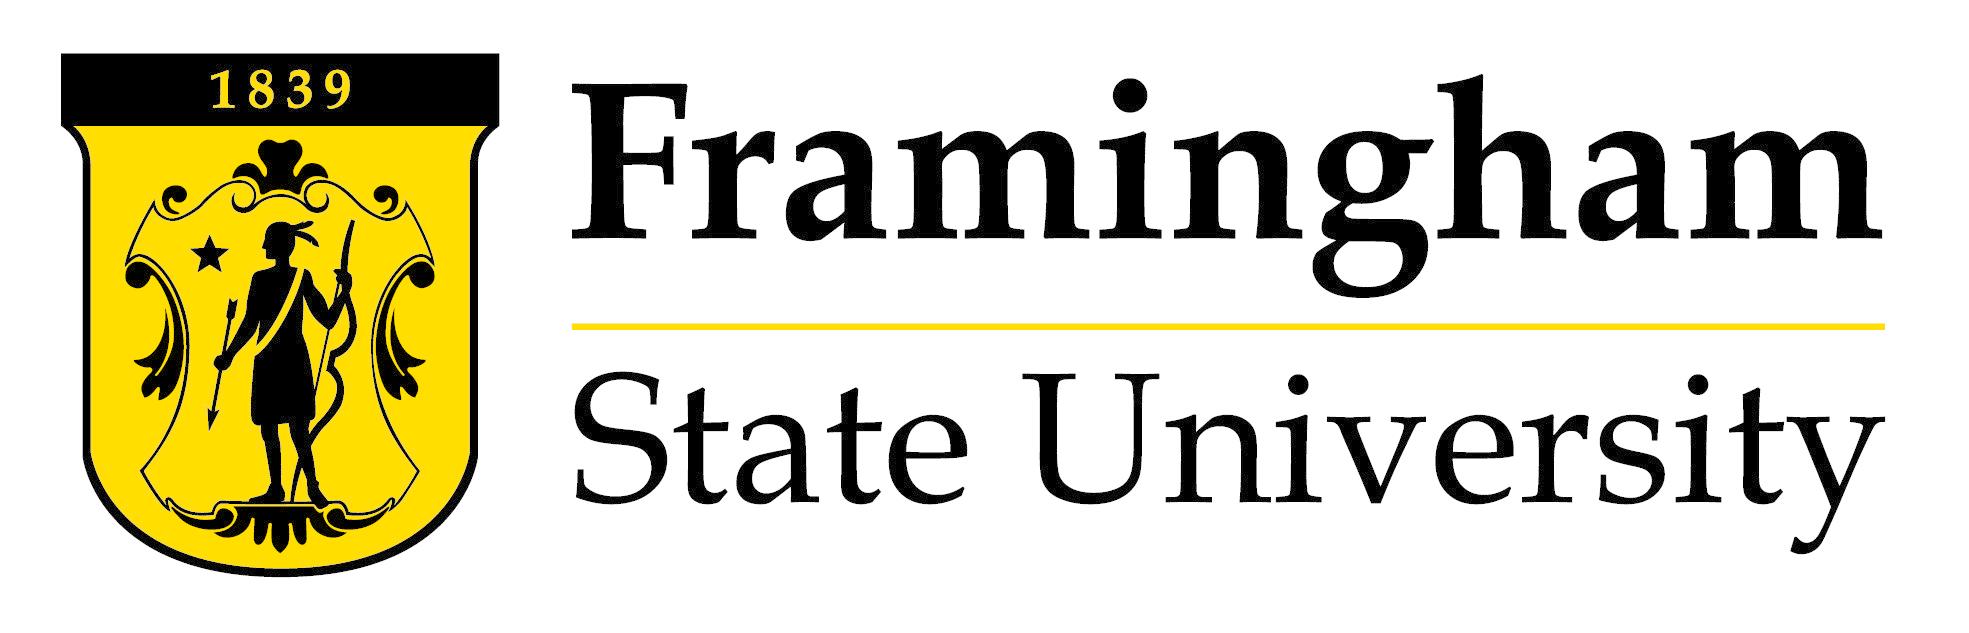 Framingham State, UMass Lowell Sign Engineering Agreement